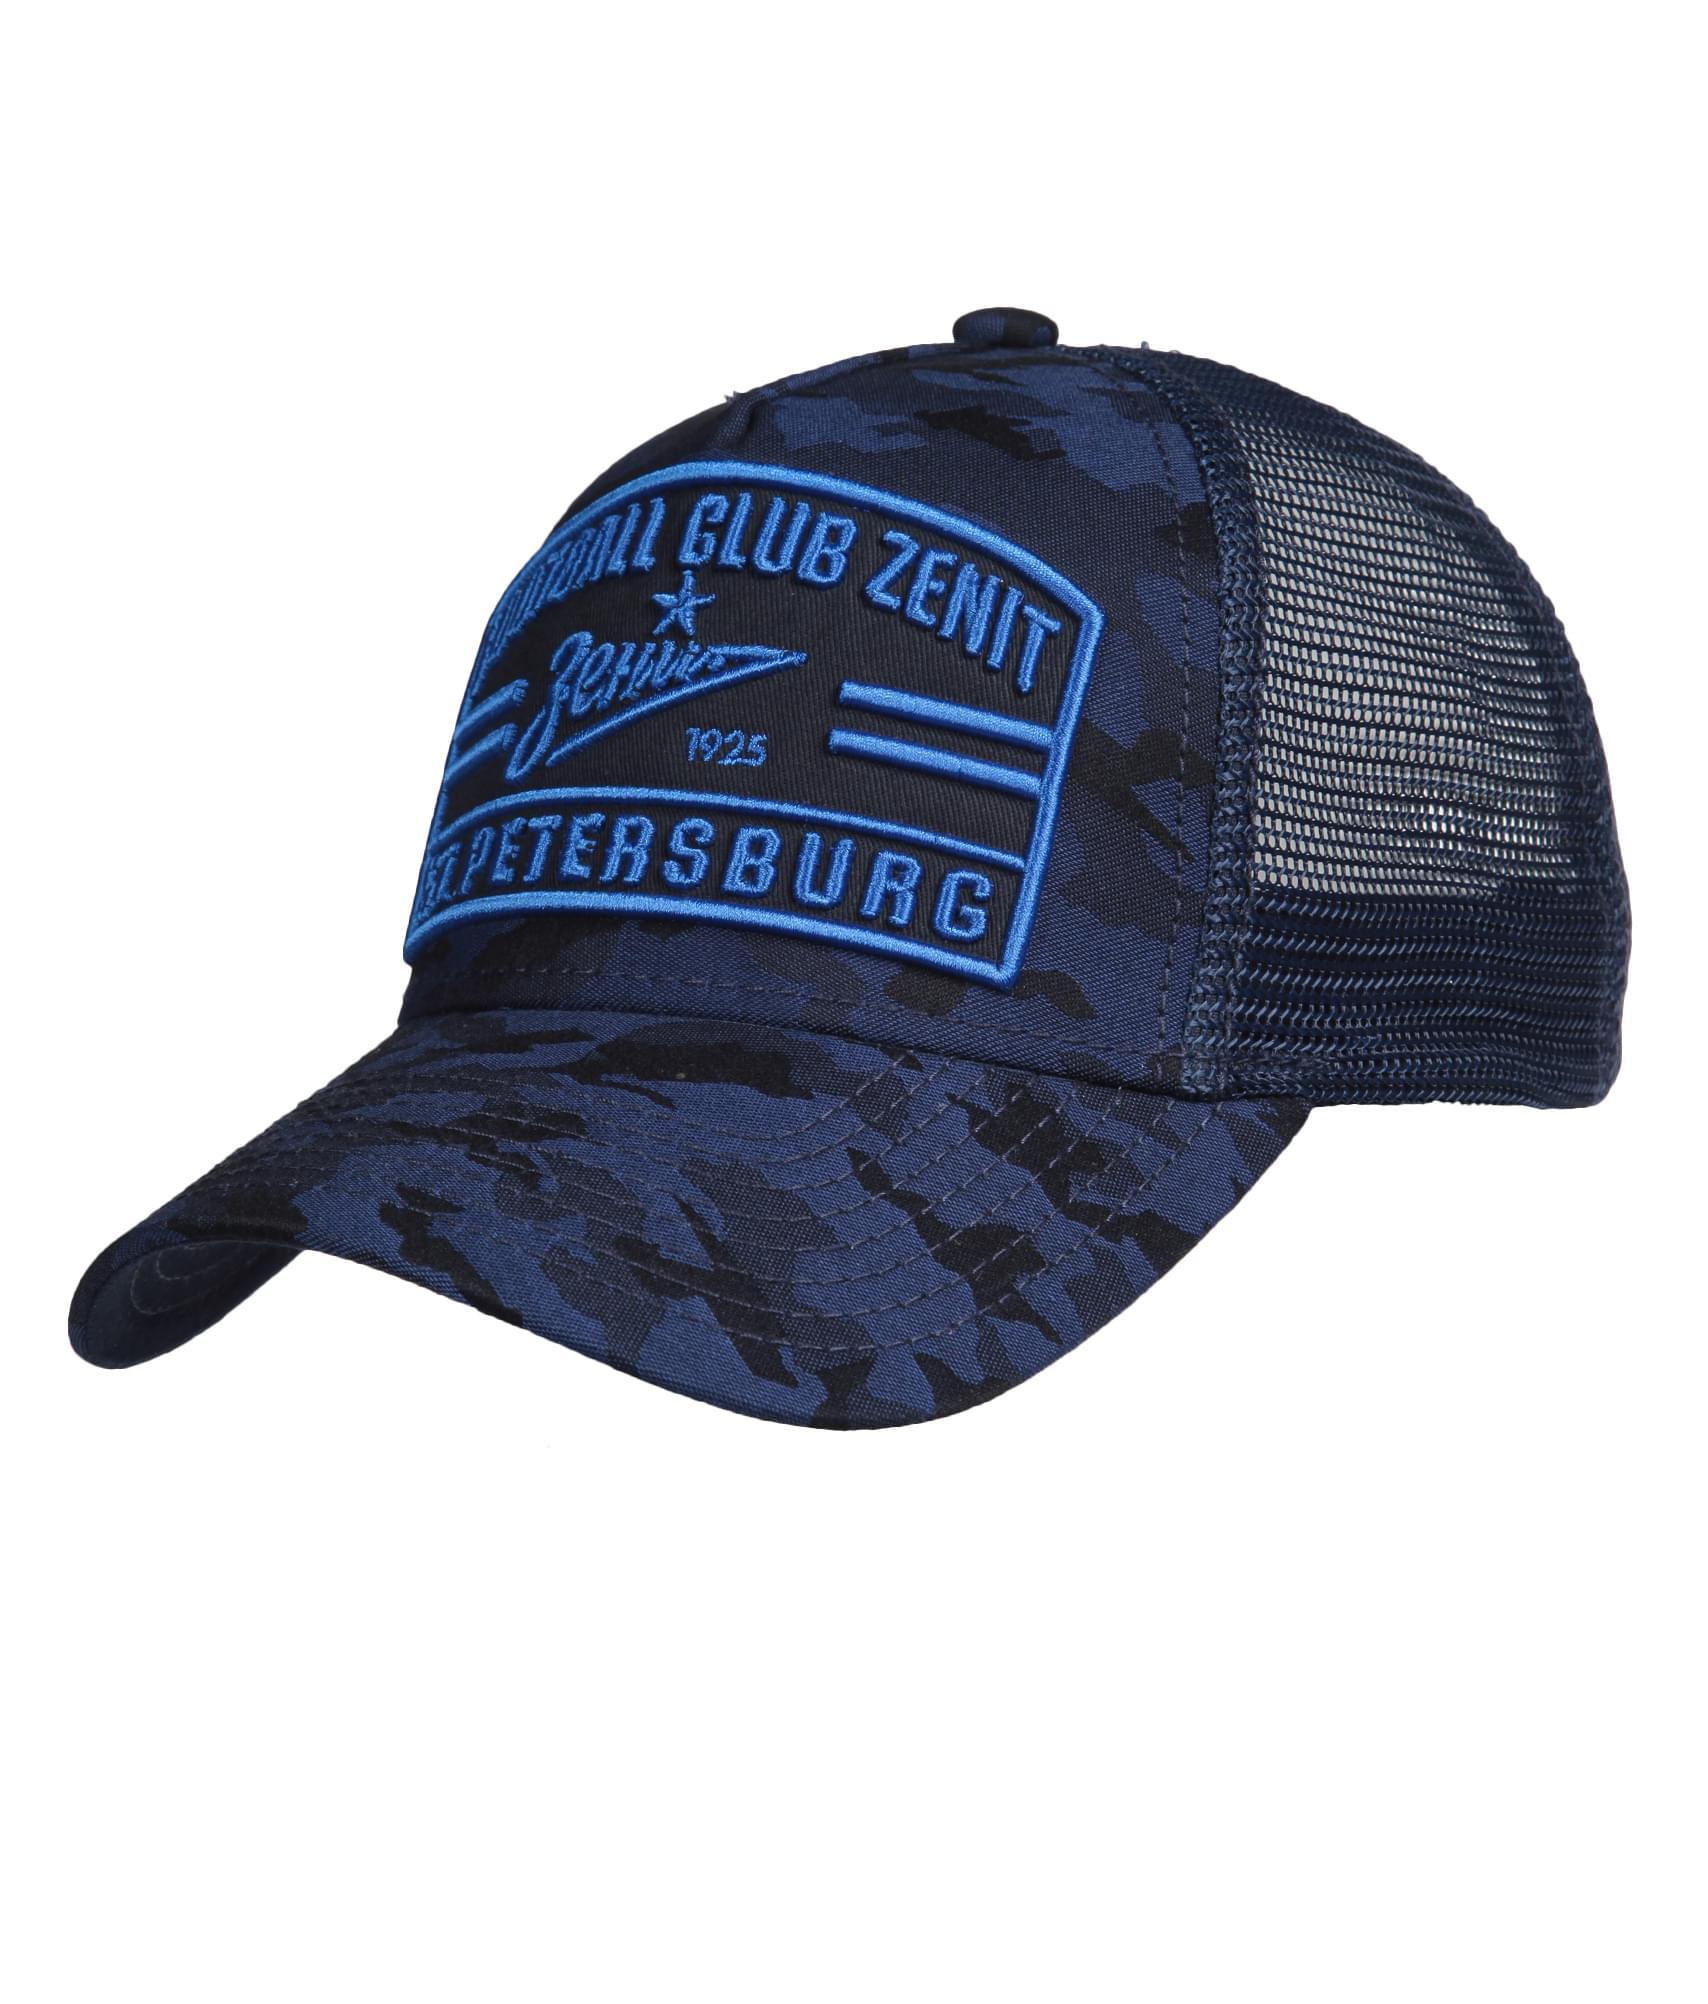 Бейсболка мужская Зенит Цвет-Темно-Синий бейсболка мужская цвет темно синий размер 55 58